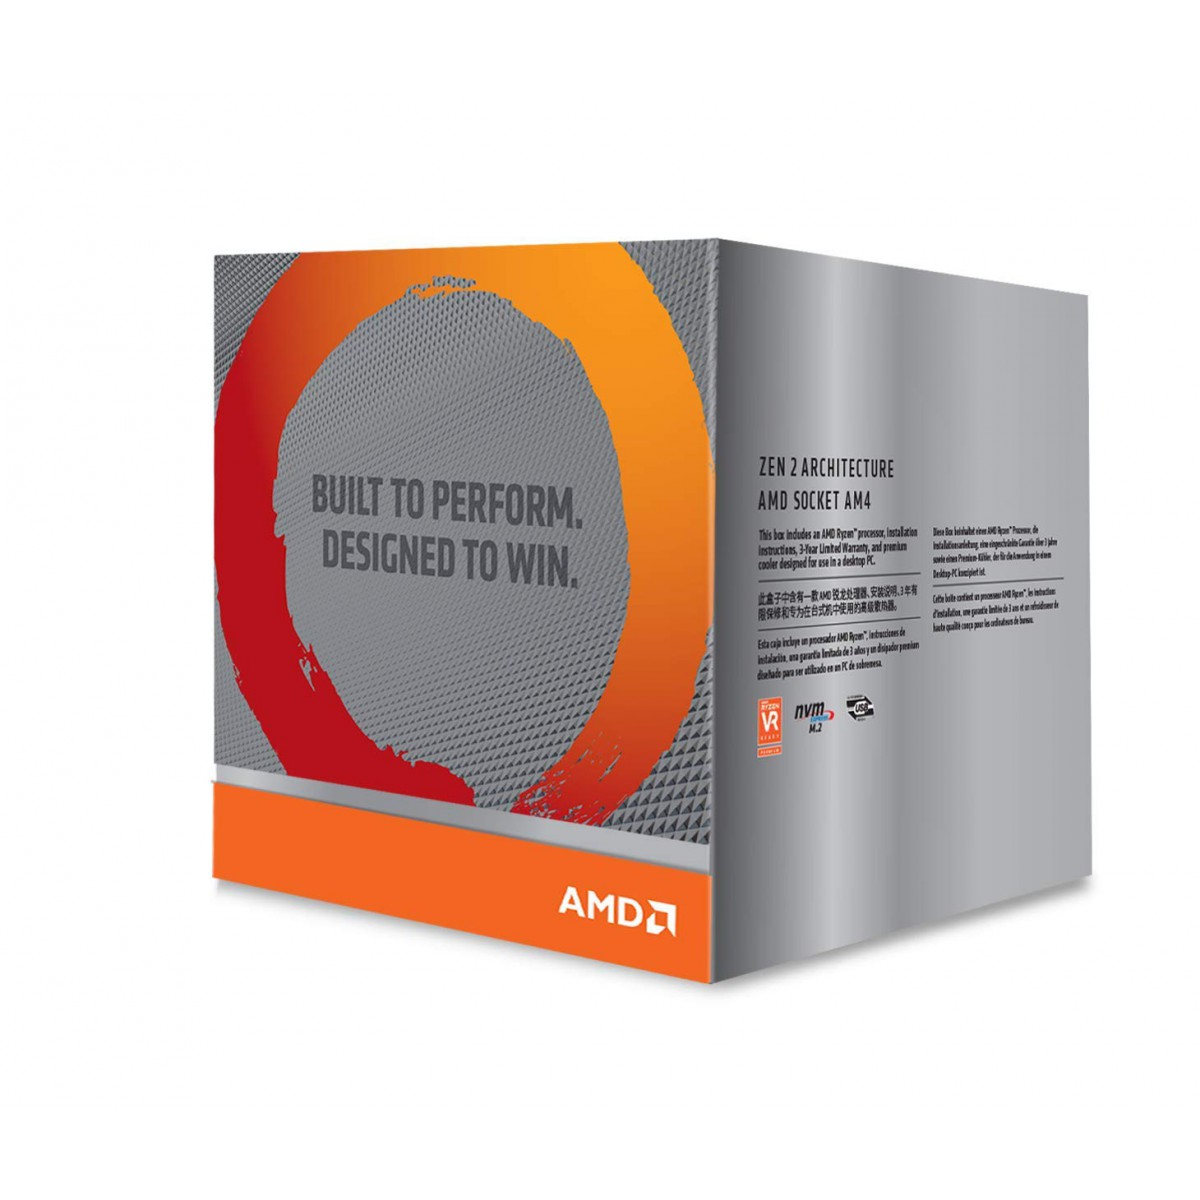 AMD Ryzen 9 3900XT procesor